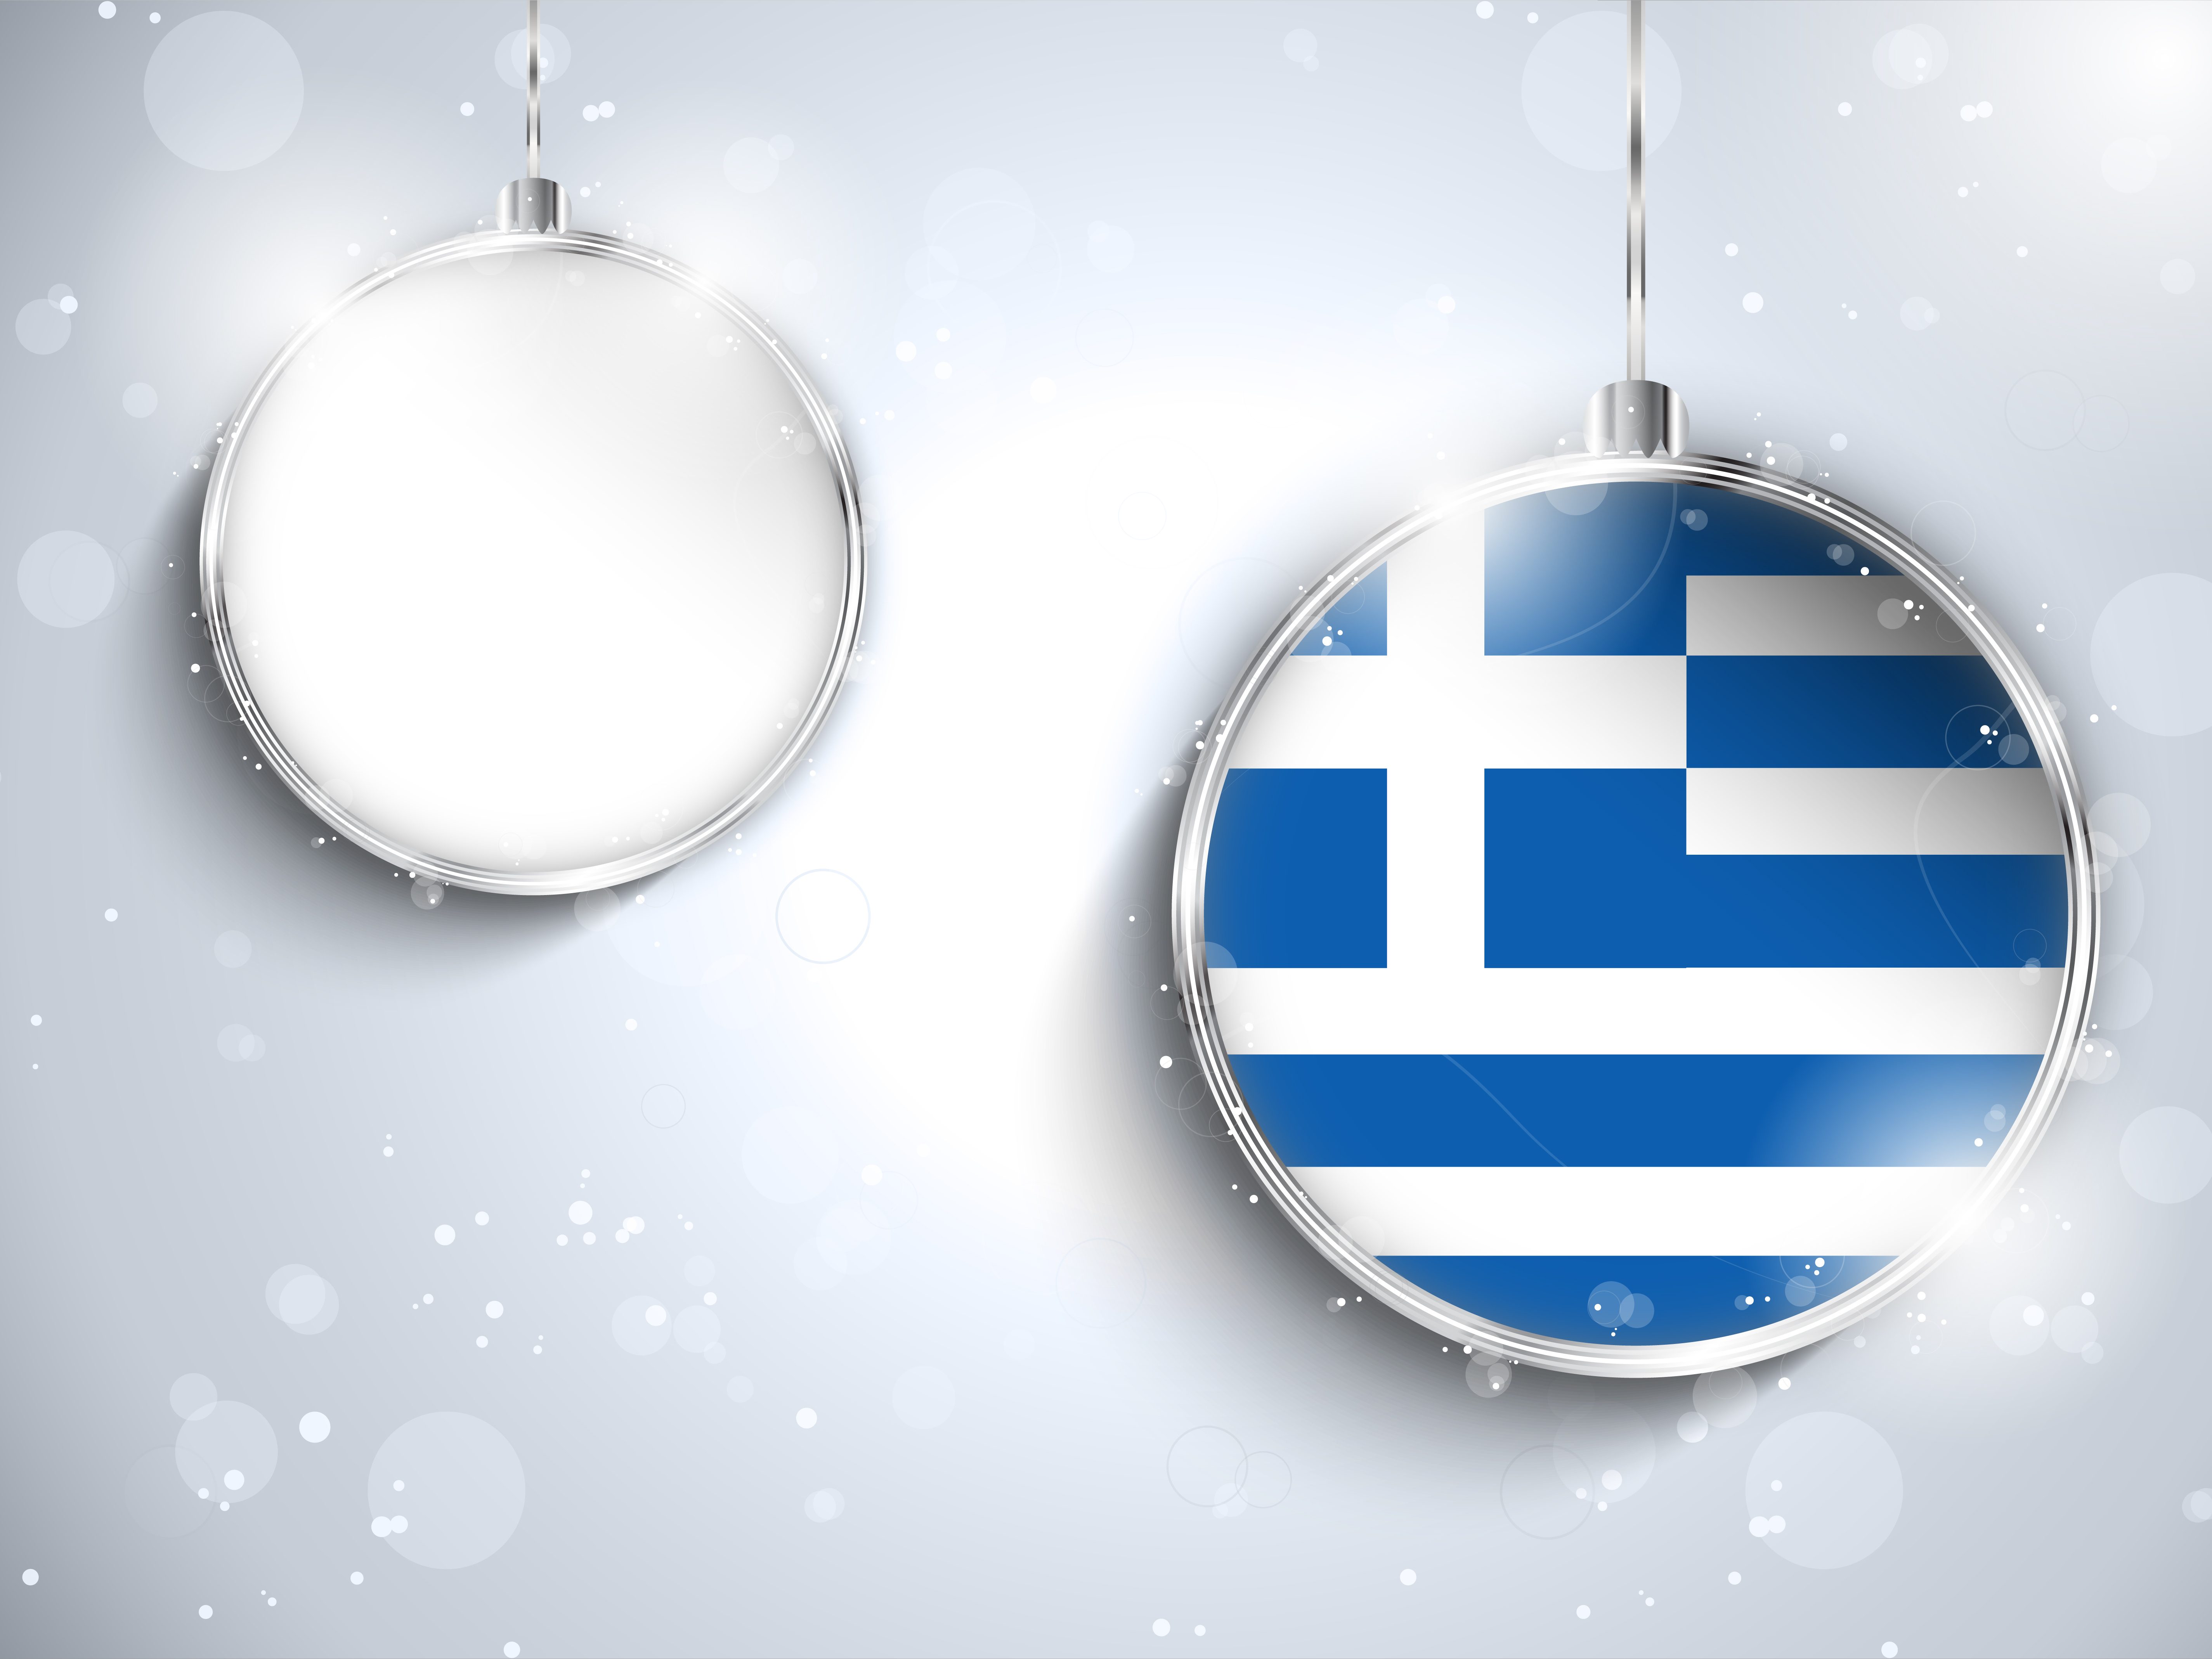 Greek Christmas Eve Tradition of Singing Carols (Kalanda)